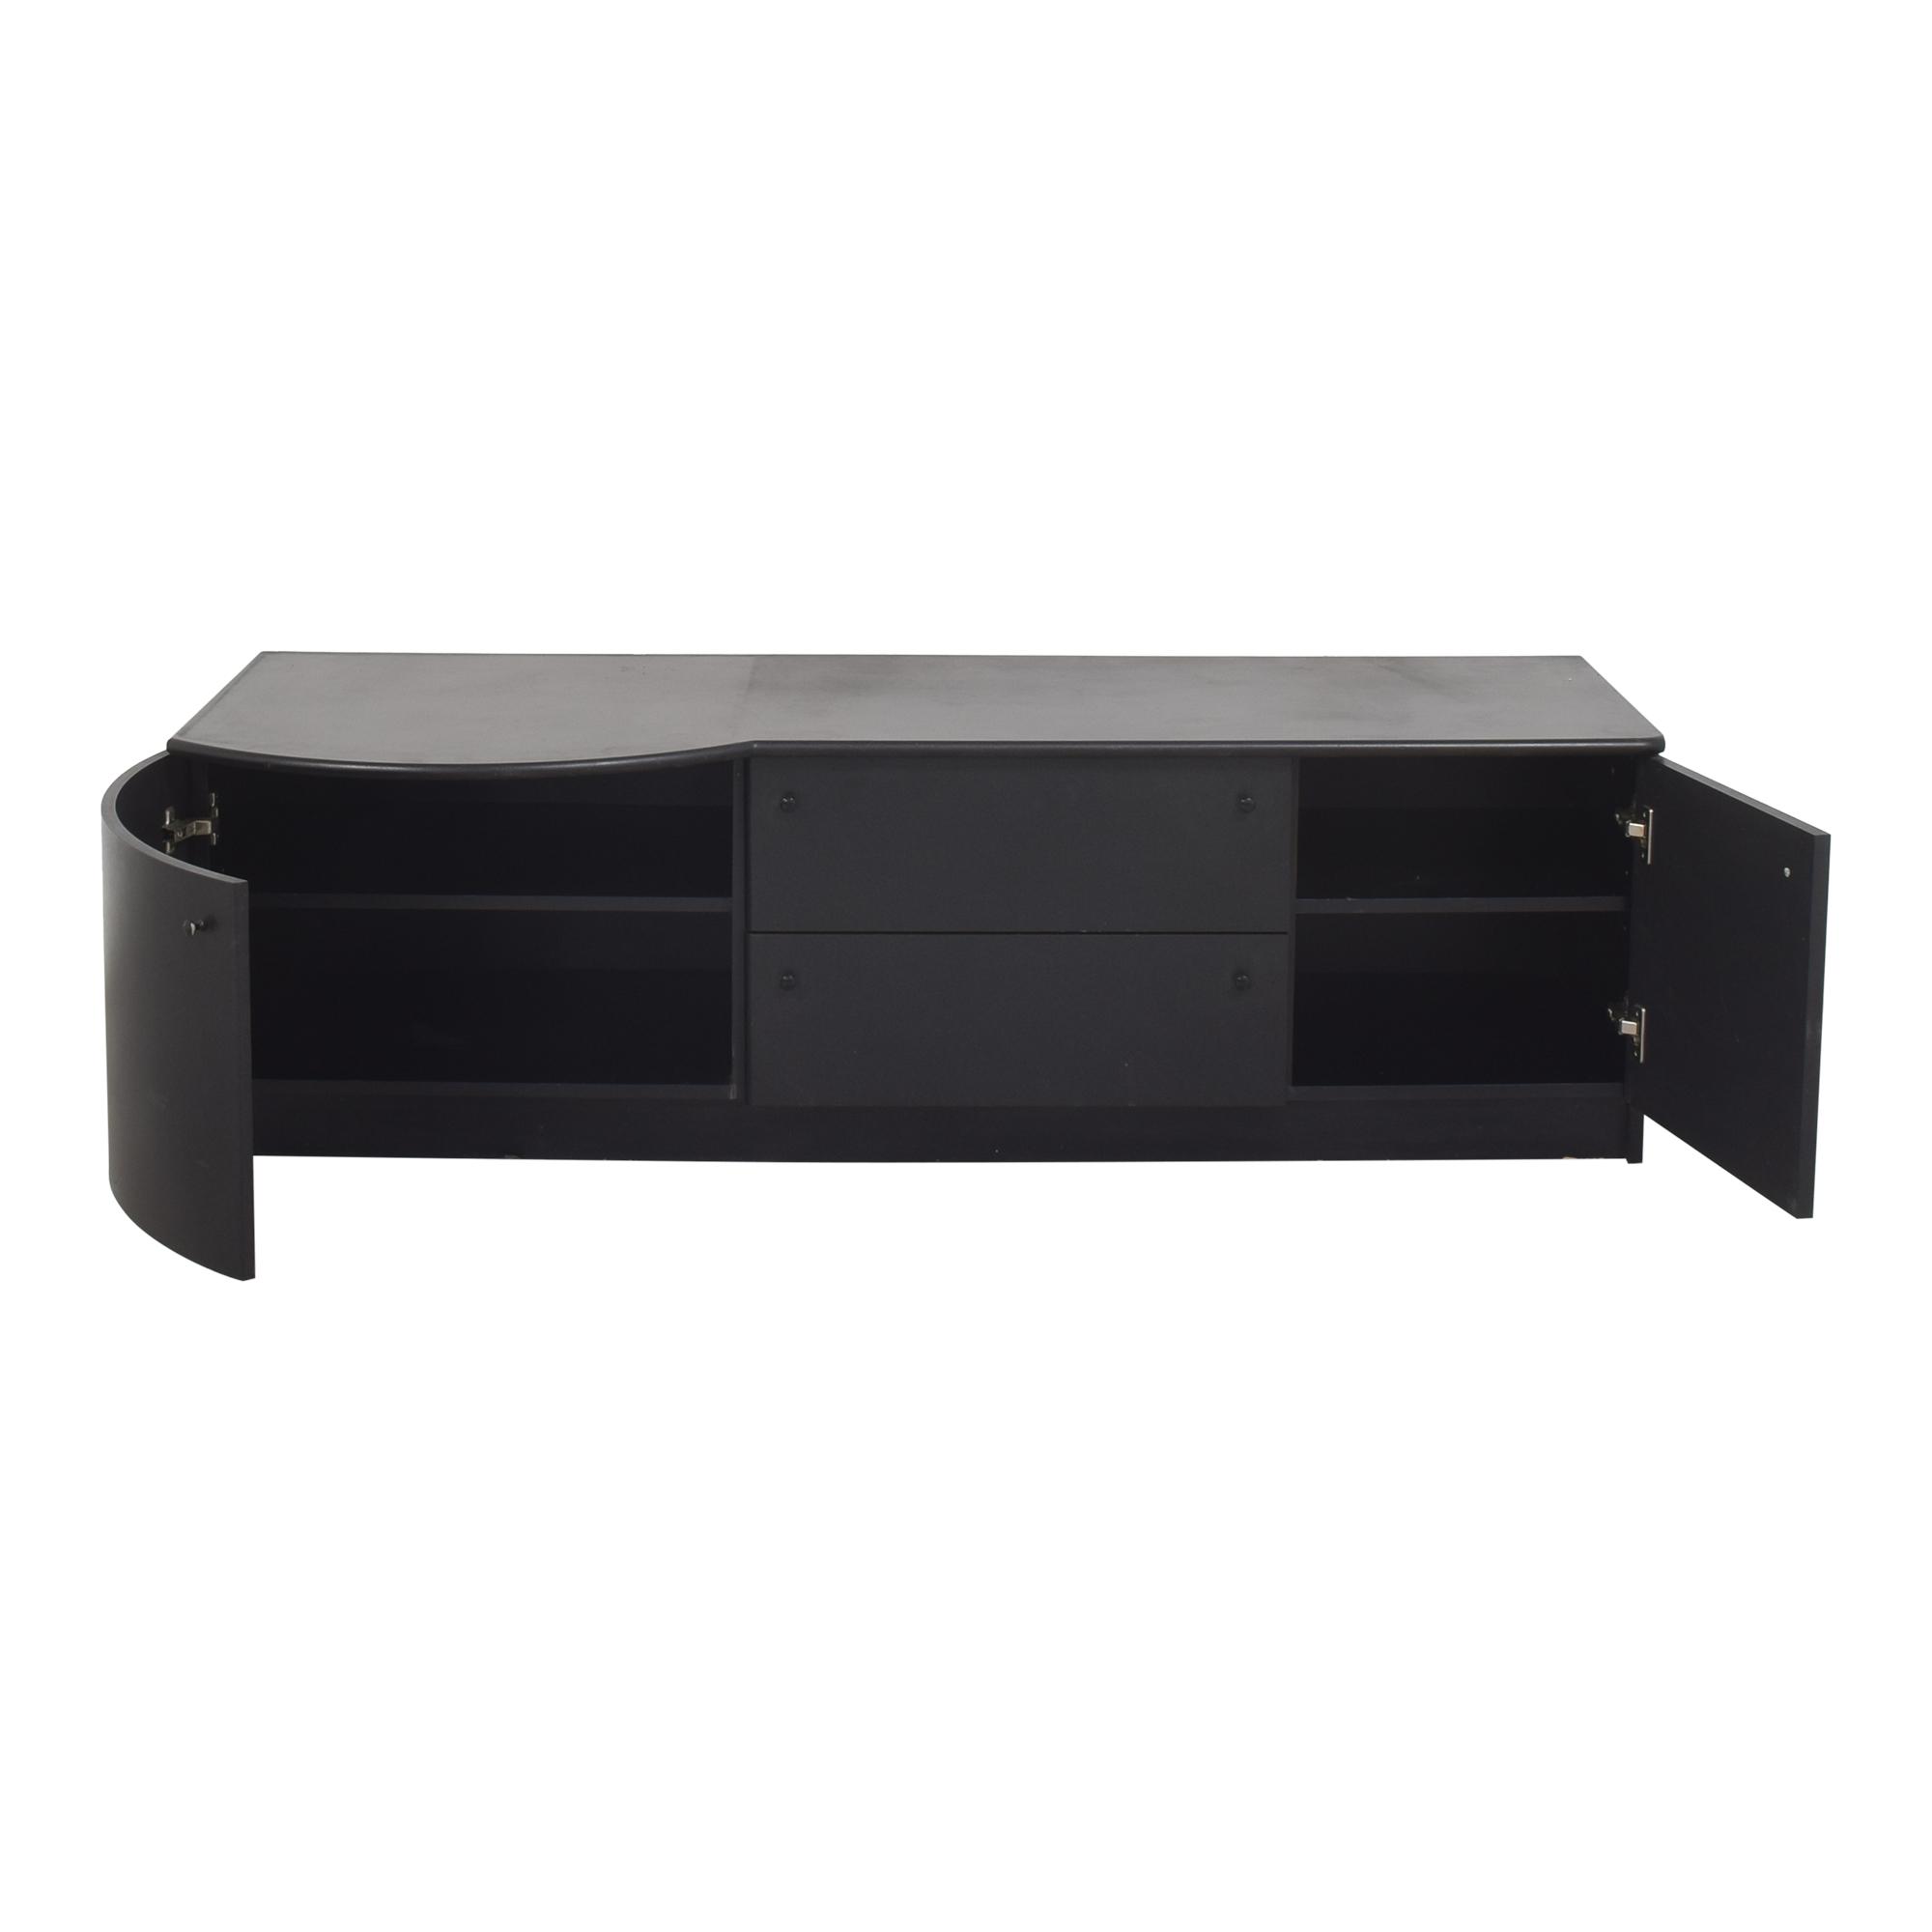 Leadra Design Leadra Design Two Drawer Media Cabinet price